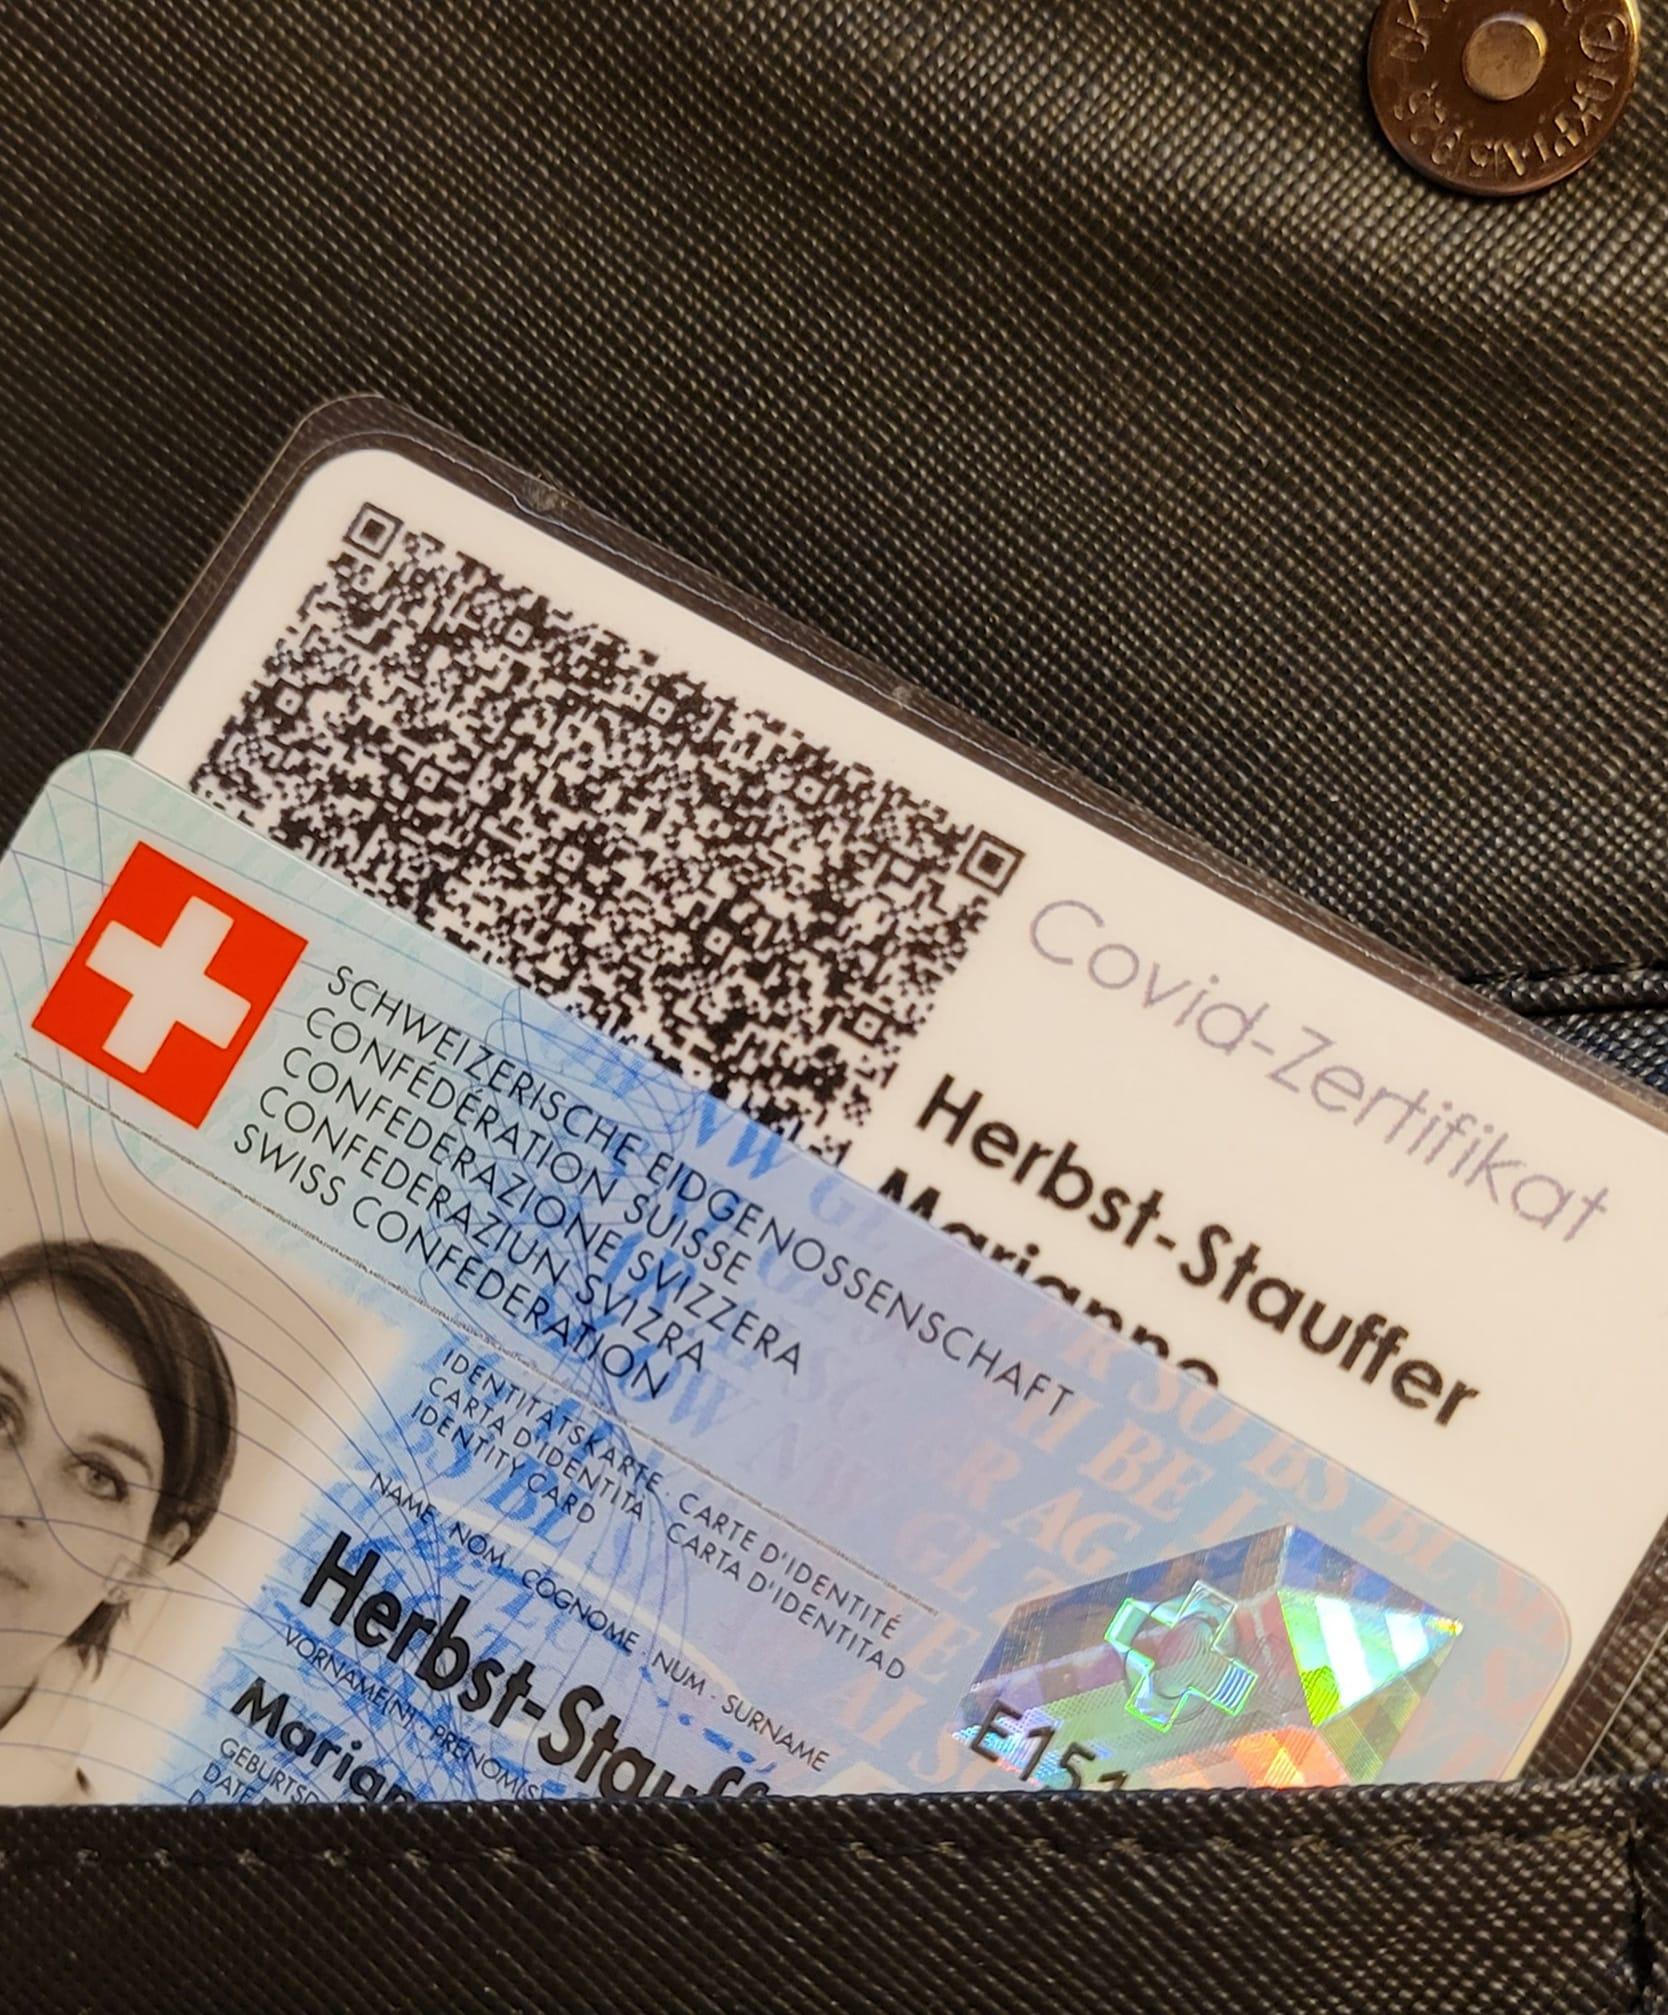 XSiSa - Zerti-Card - Zertifikat im Kreditkartenformat